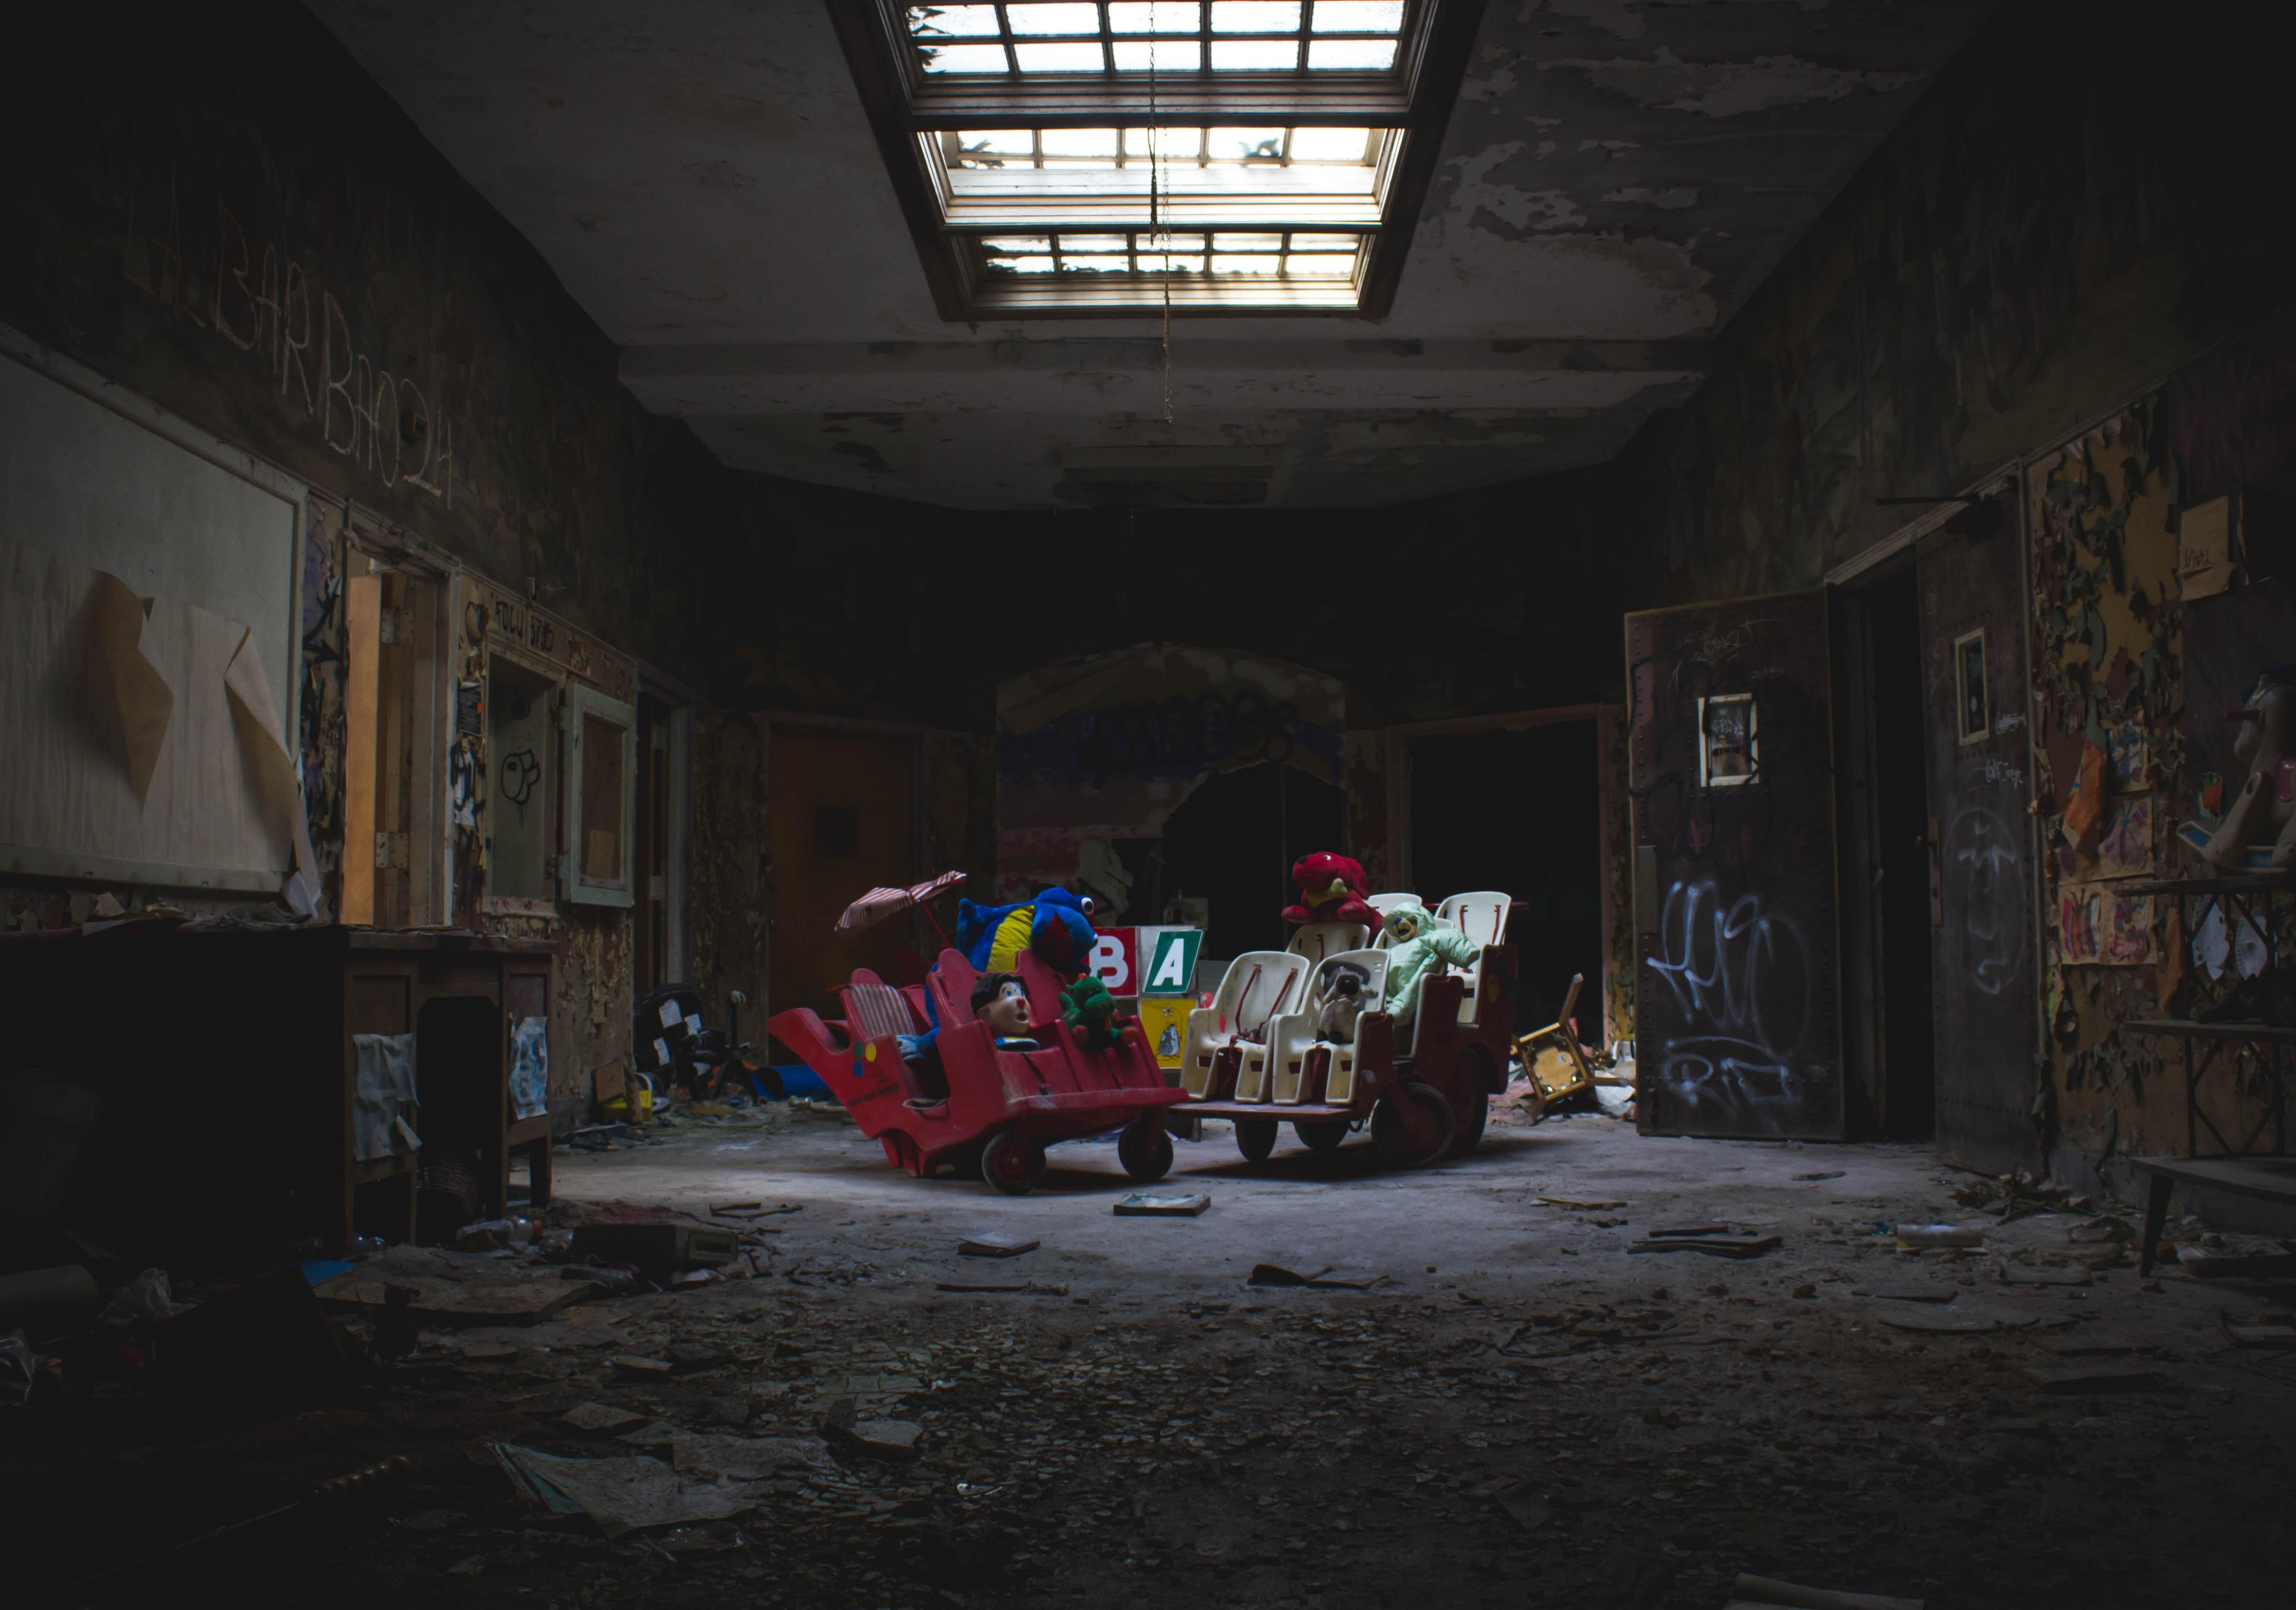 Abandoned Building Pictures Download Free Images On Unsplash